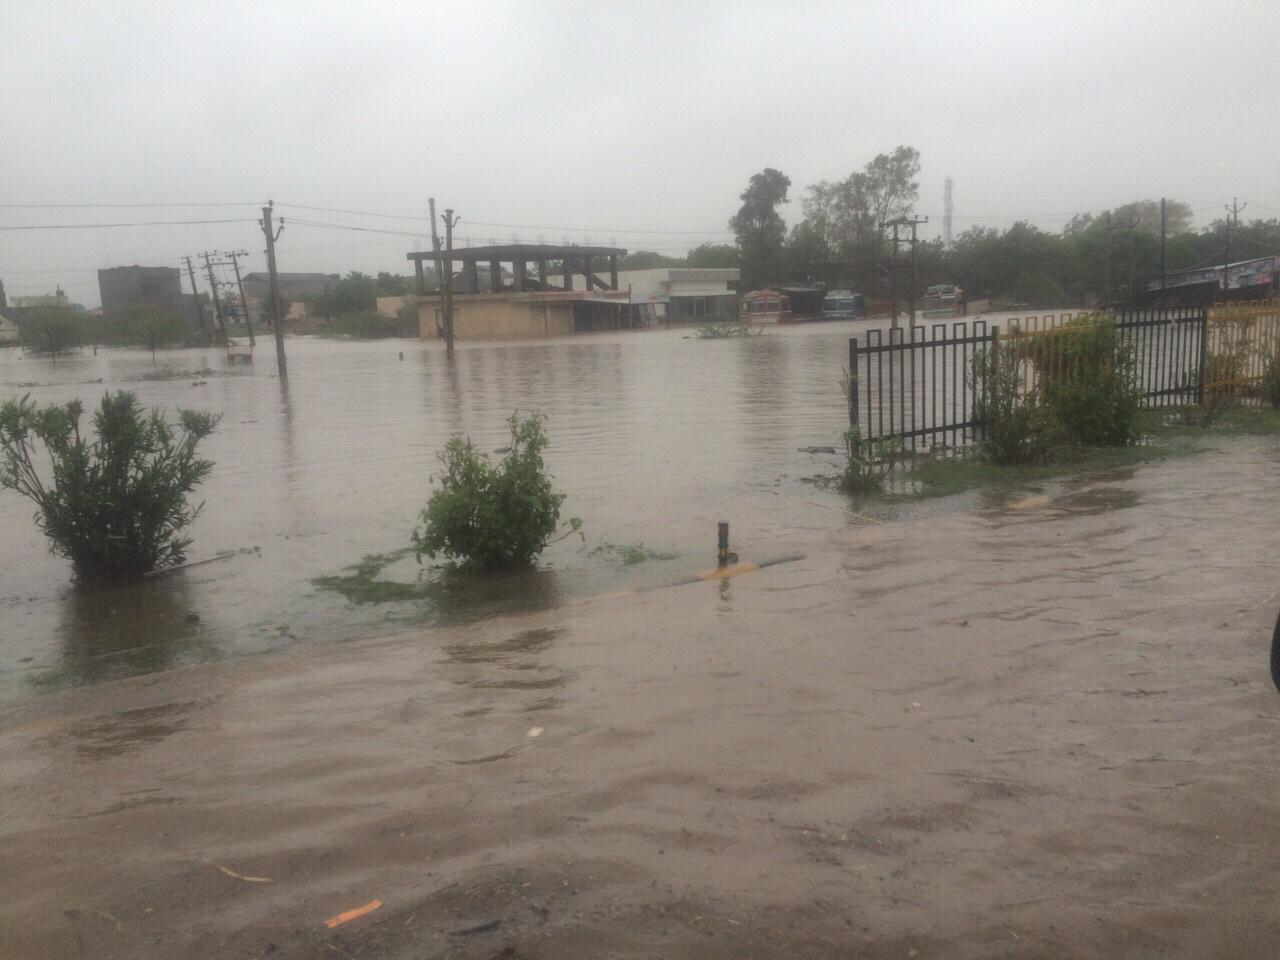 Gujarat : Heavy rain causes flood like situation in Rajkot http://t.co/Xn6lAg58el